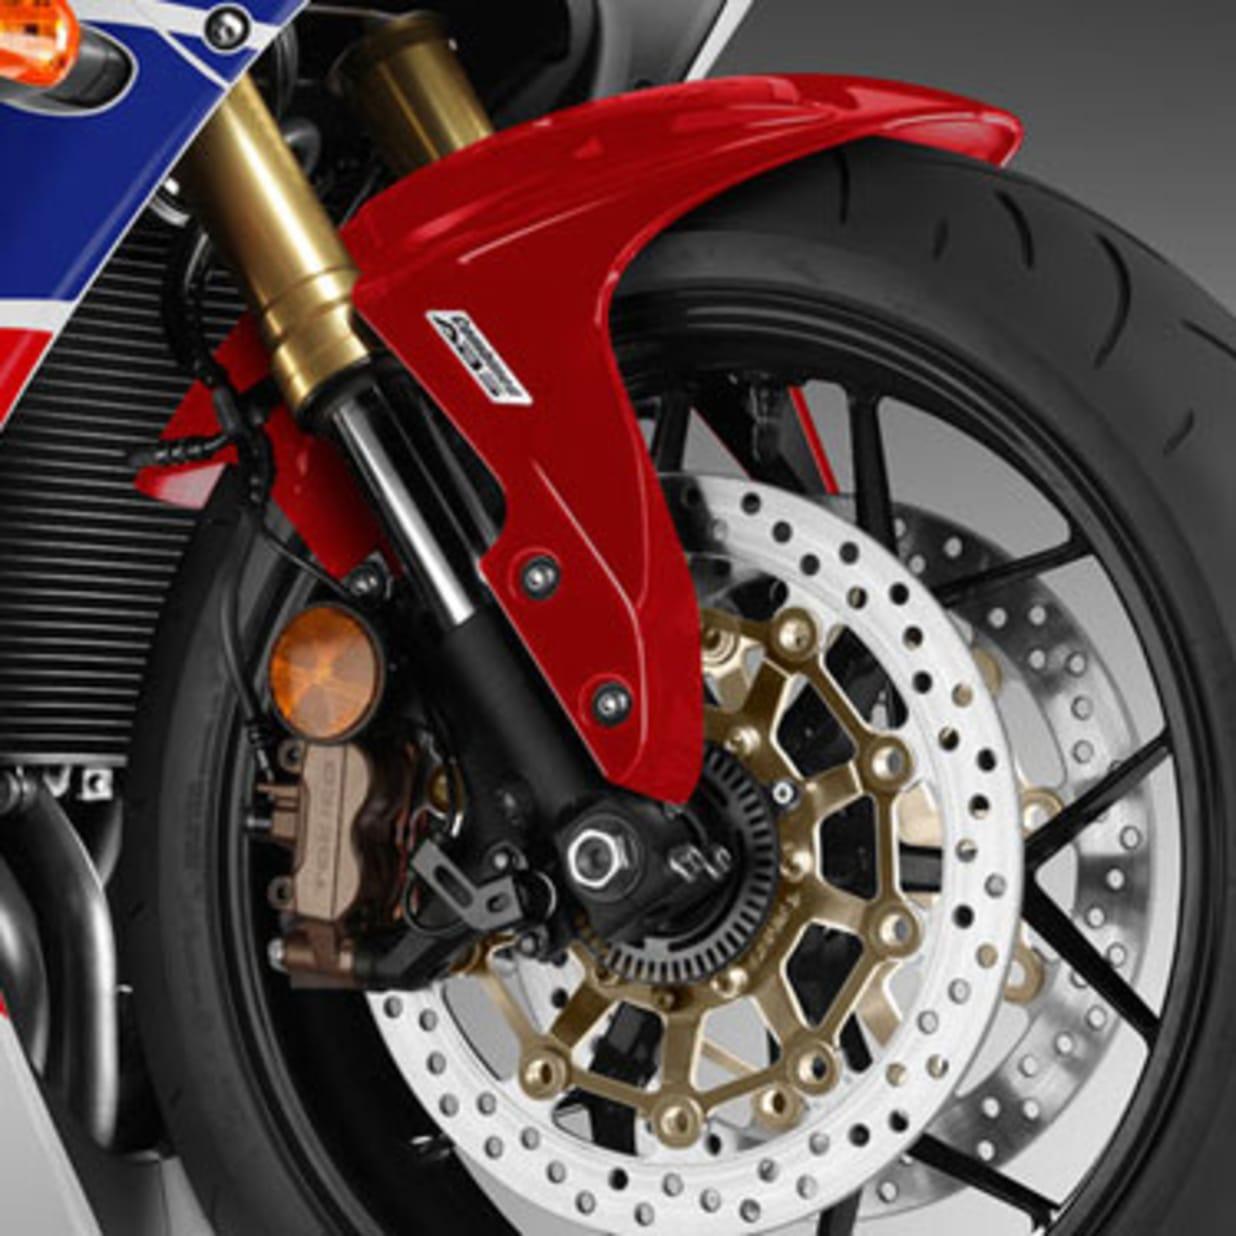 Honda Motor Bikes Al Futtaim Uae Cover Shock Cbr 150r Book A Service Let Us Take Care Of It Peace Mind Guaranteed